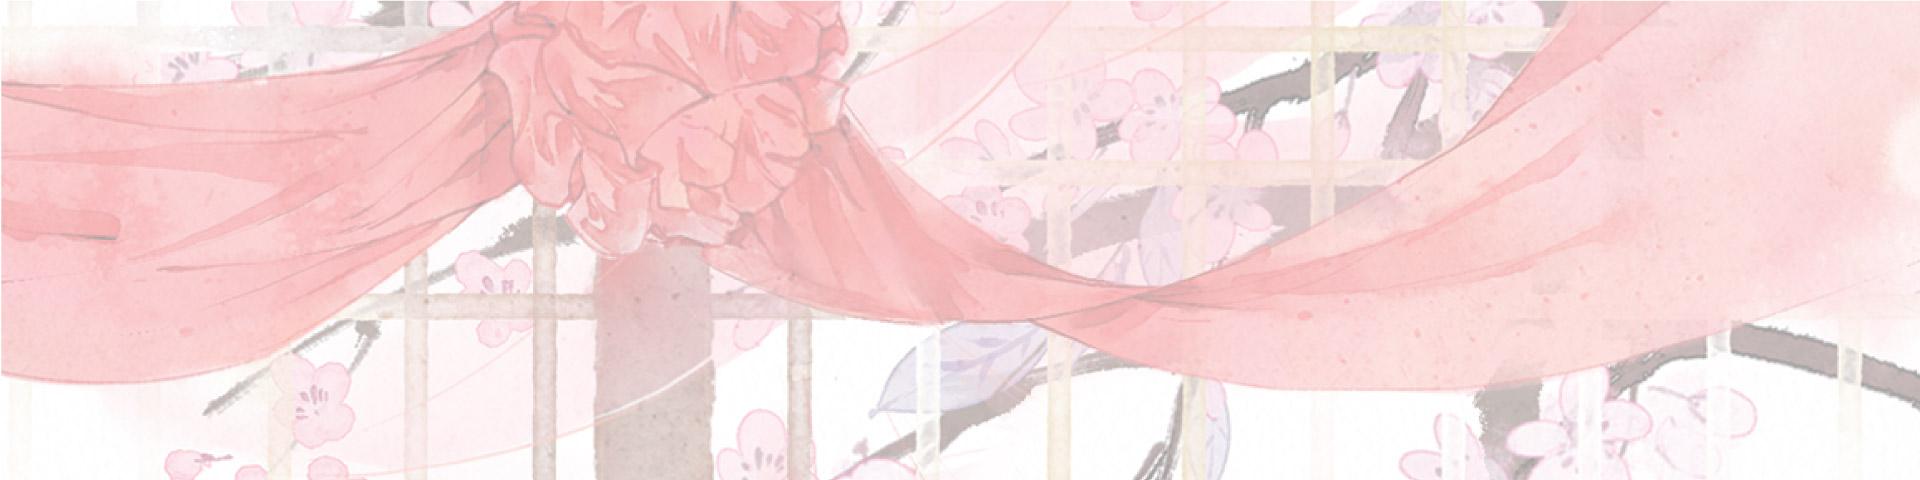 Banner-BK_1920X480cm.